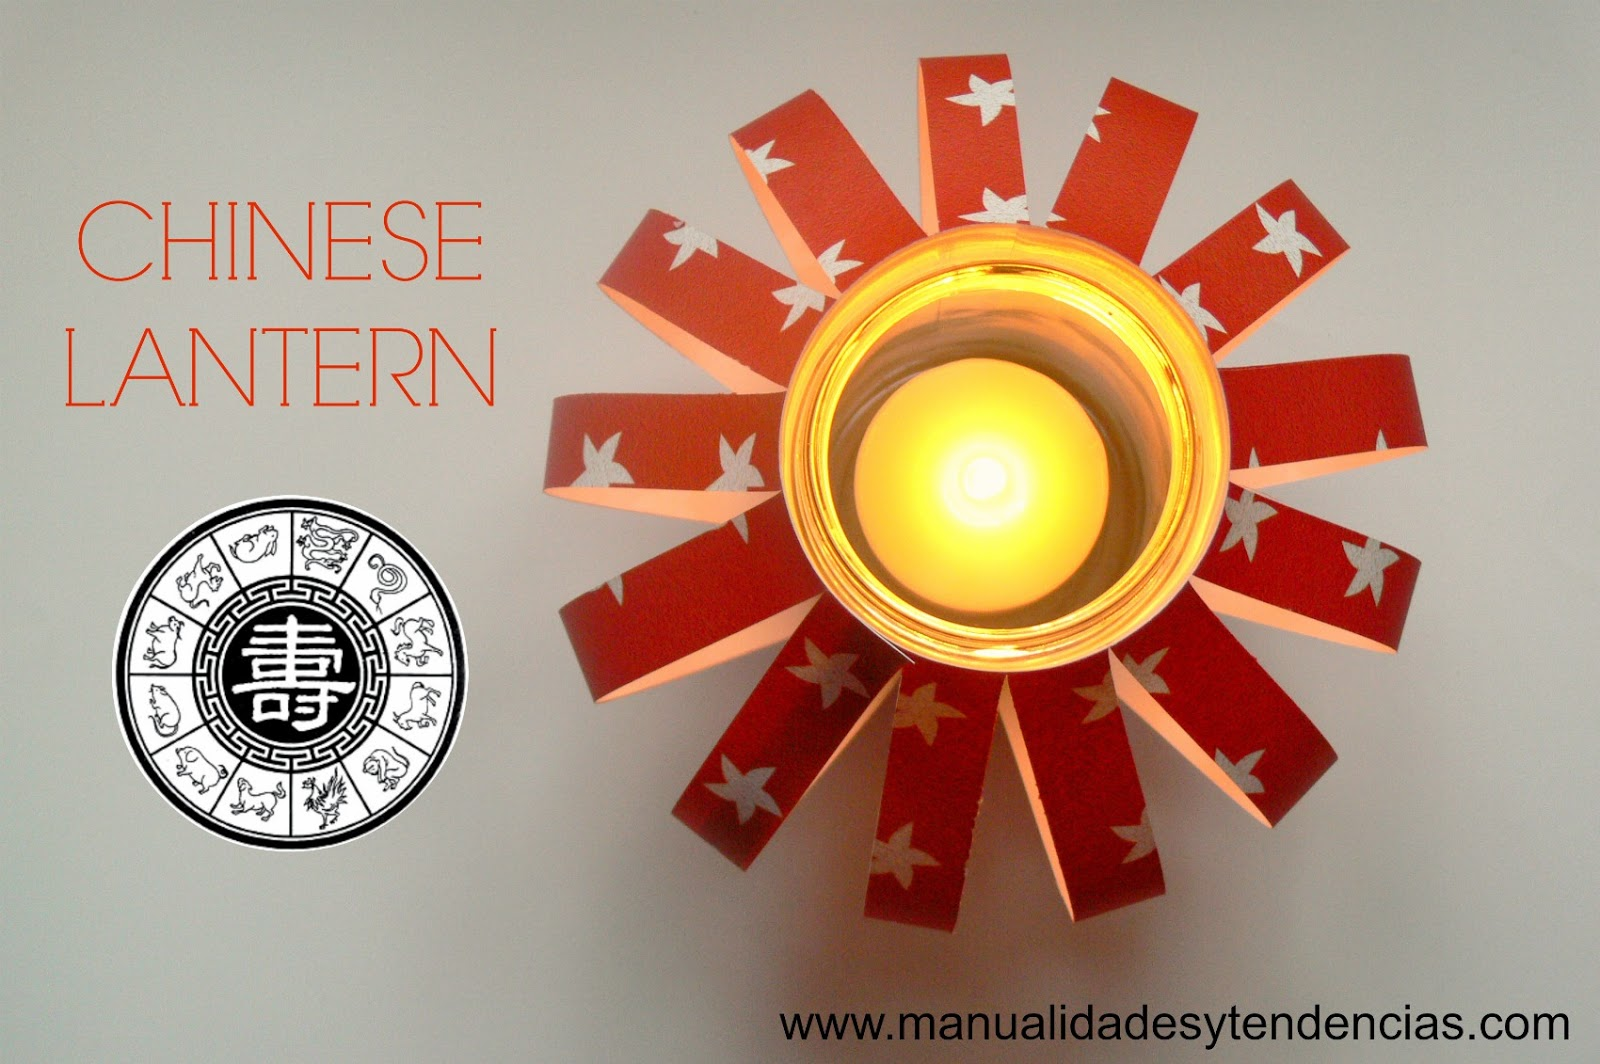 Handmade paper lantern for Chinese New year